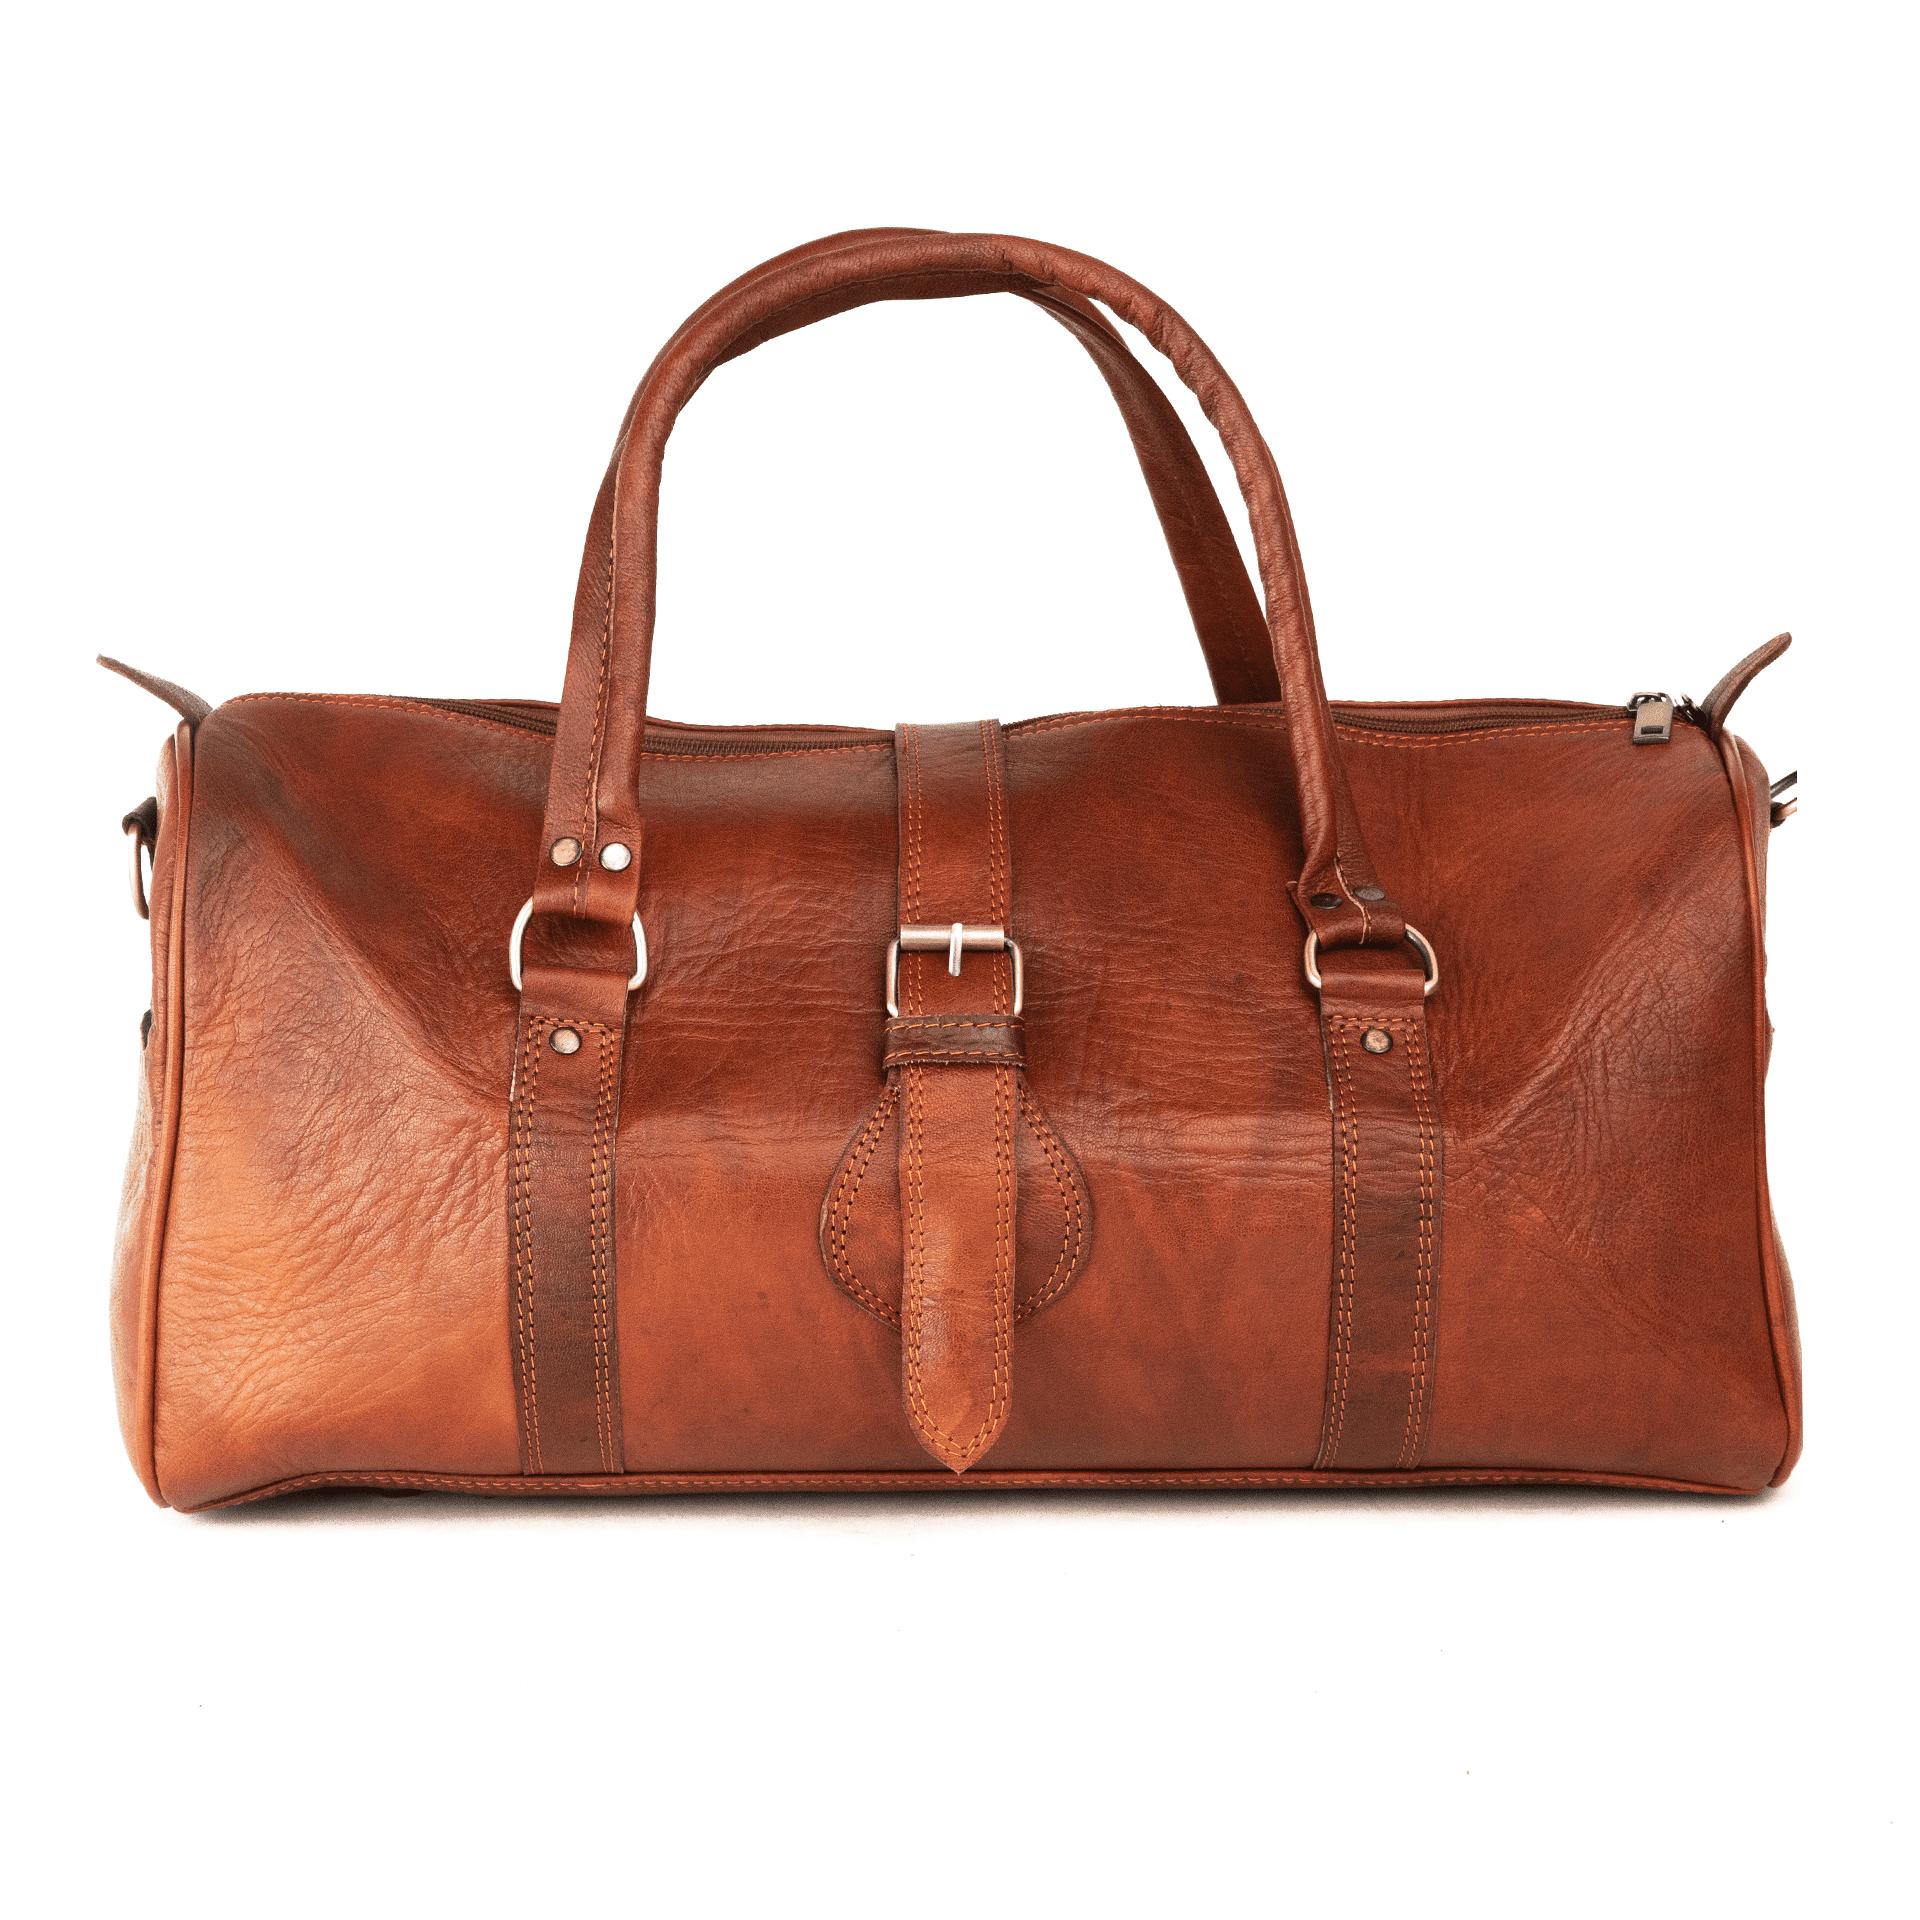 Made Leather Co. Aviator Weekender Bag